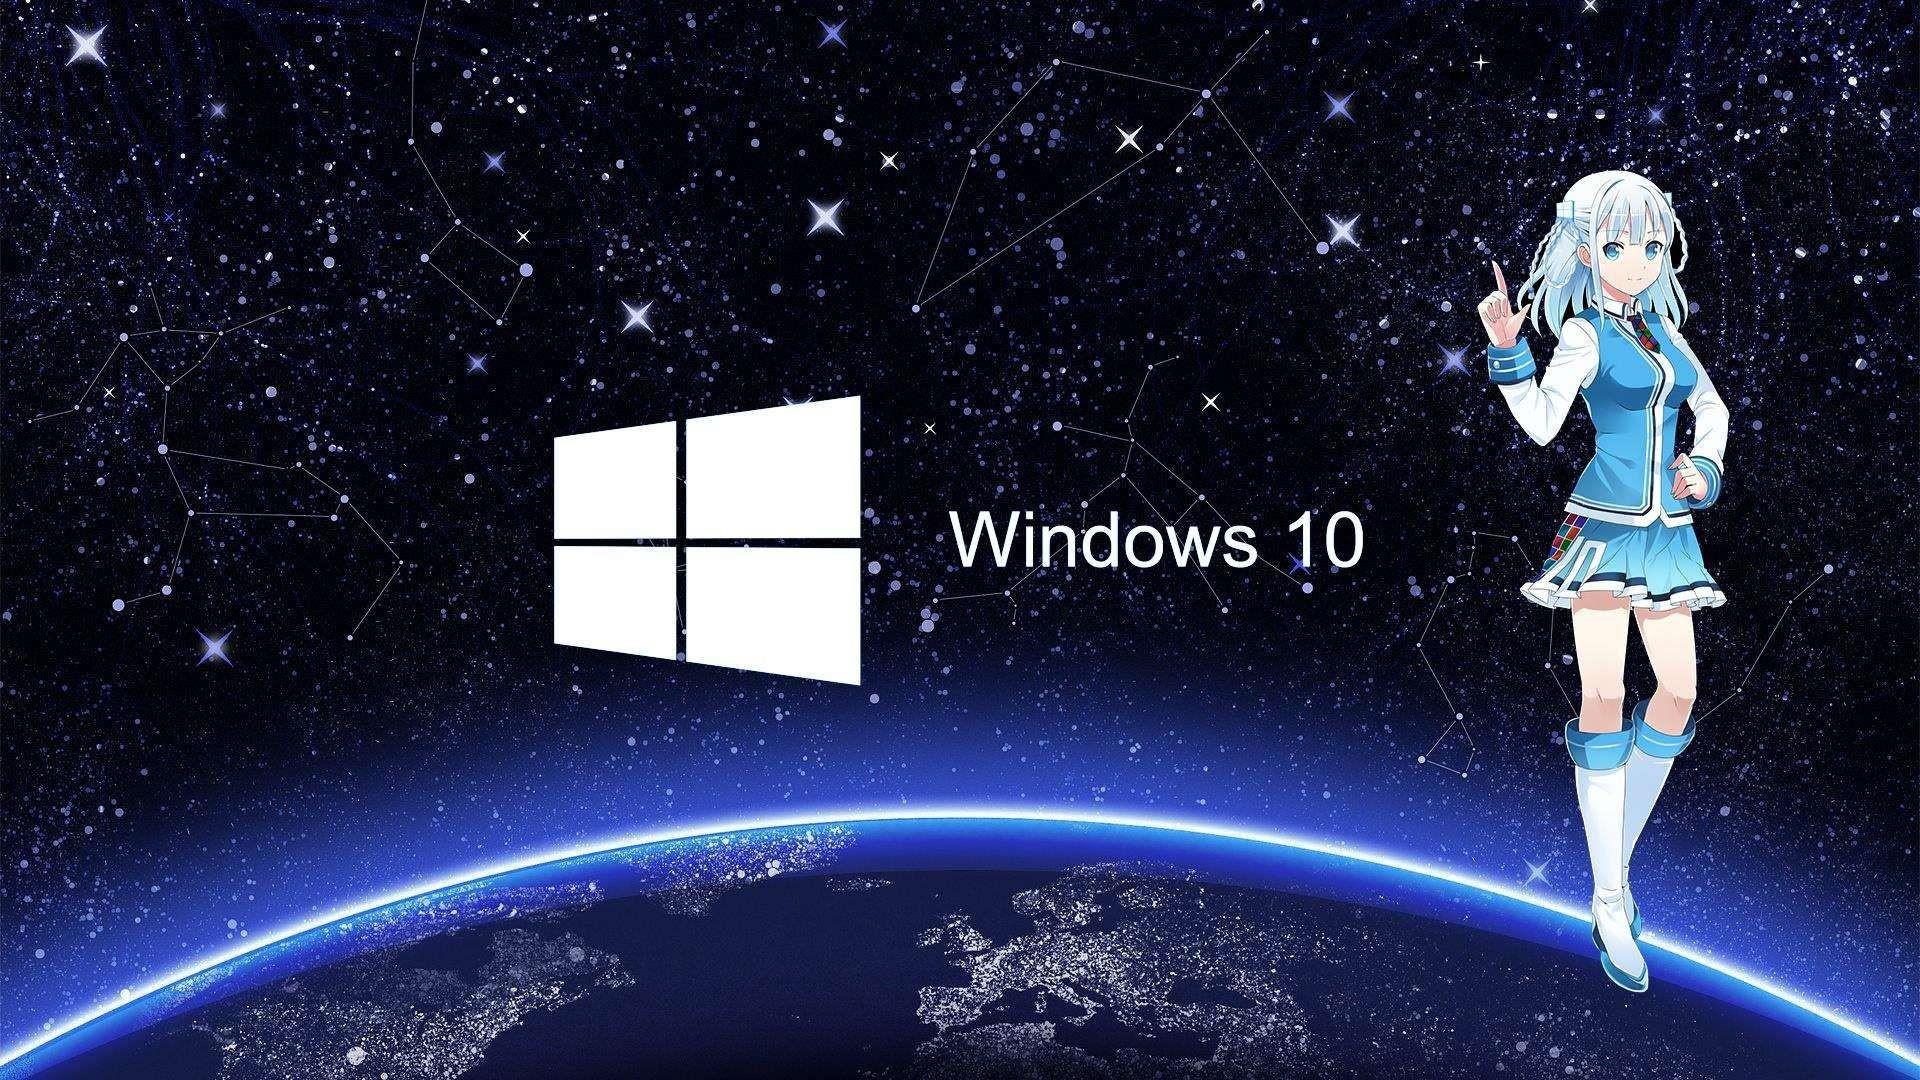 19 Live Wallpaper Anime Pc Windows 10 Baka Wallpaper